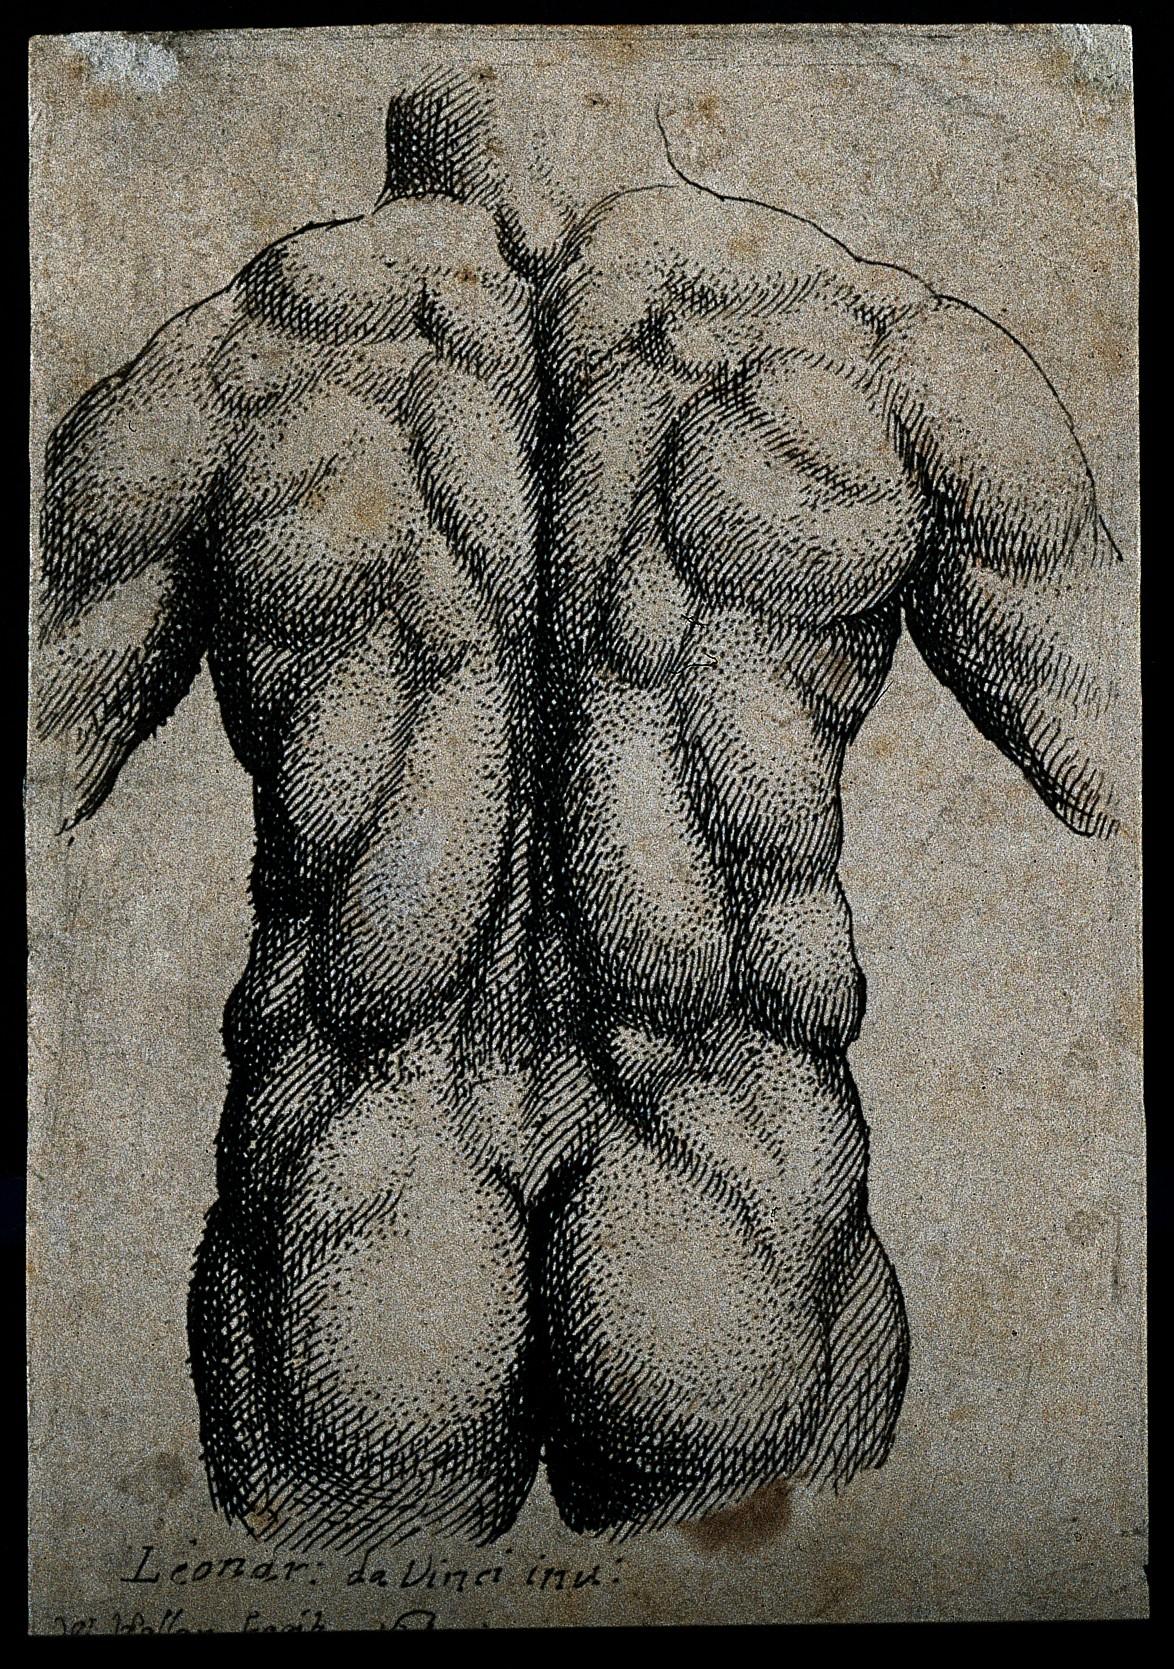 File:Leonardo da Vinci; engravings of anatomical drawings Wellcome ...